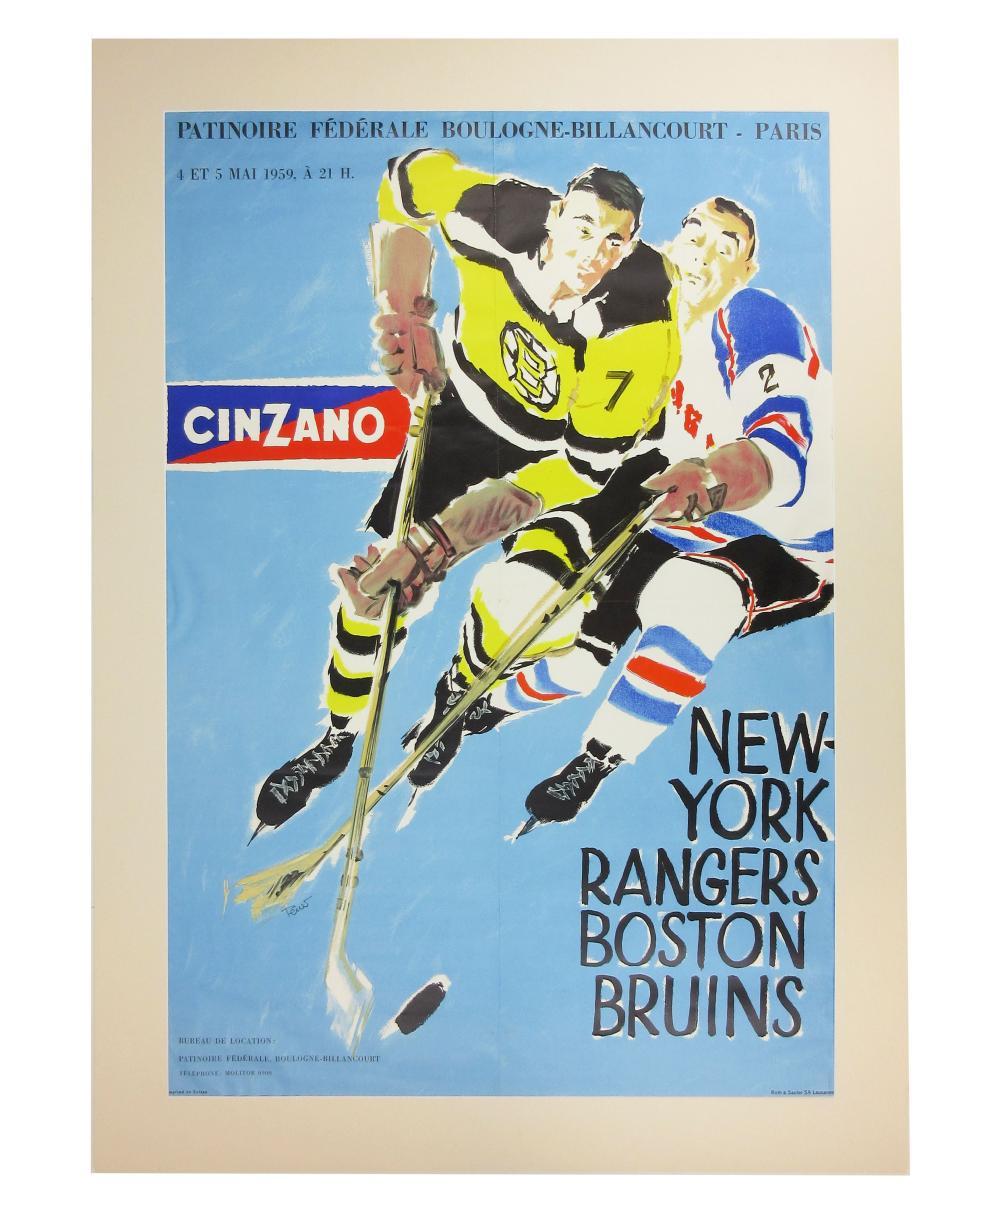 New York Rangers vs. Boston Bruins 1959 Cinzano European Tour Poster